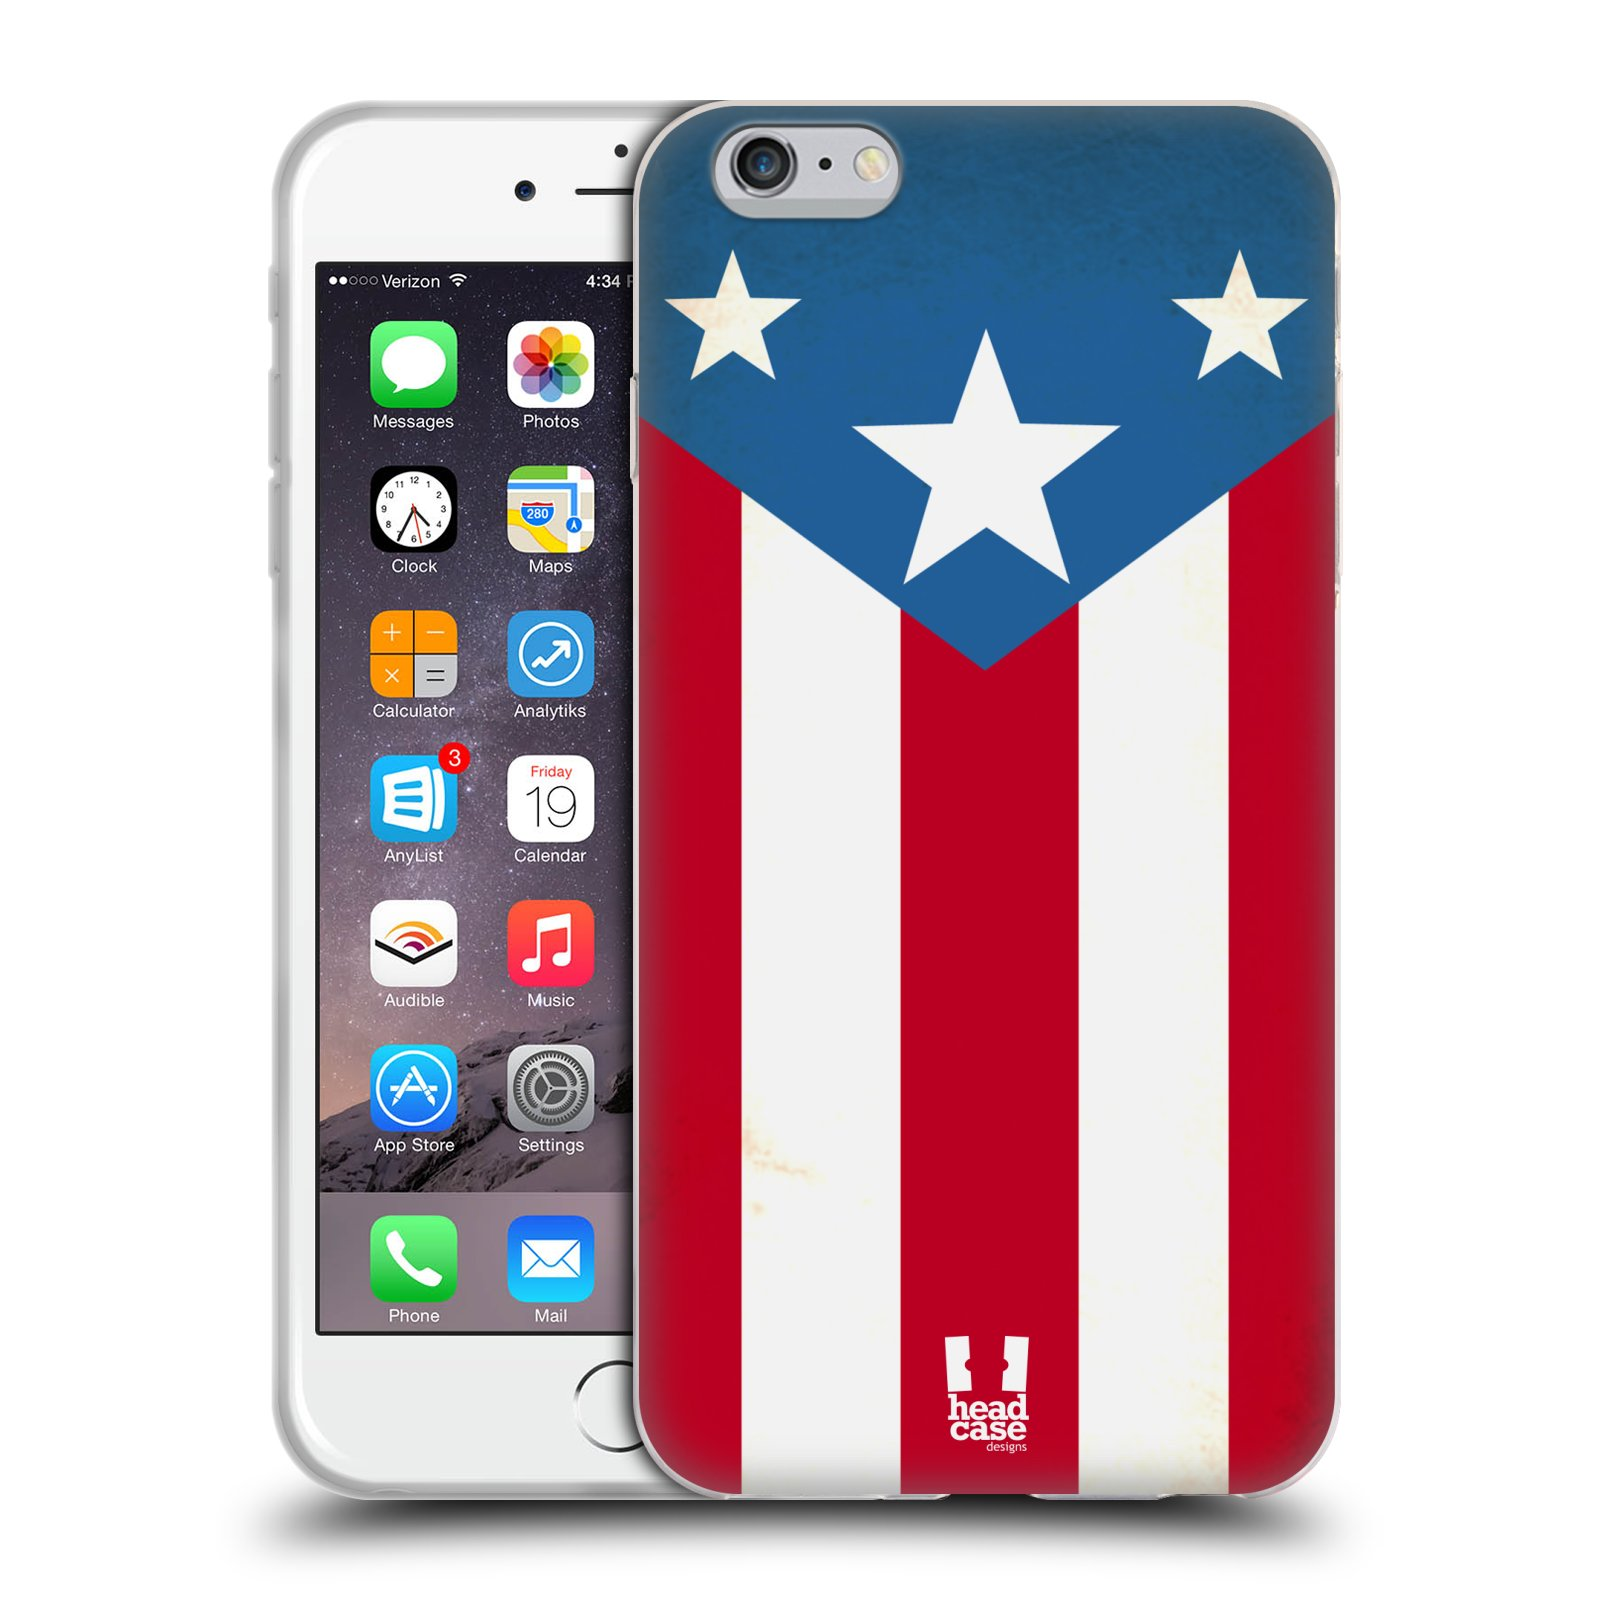 HEAD CASE silikonový obal na mobil Apple Iphone 6 PLUS/ 6S PLUS vzor Americká pýcha VLAJKA